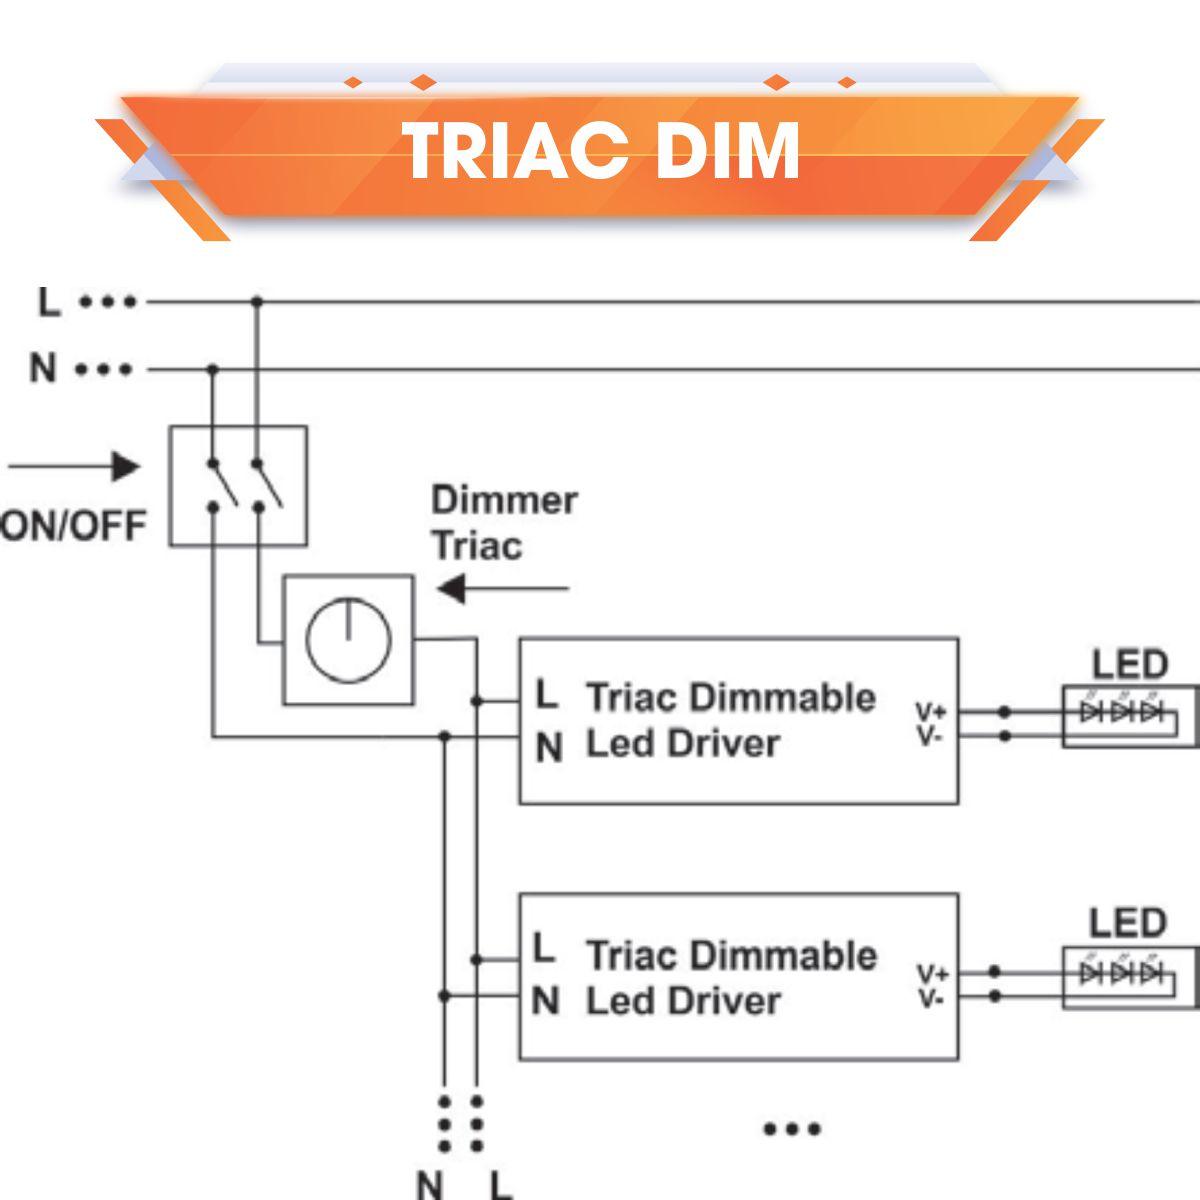 Dimmer Triac